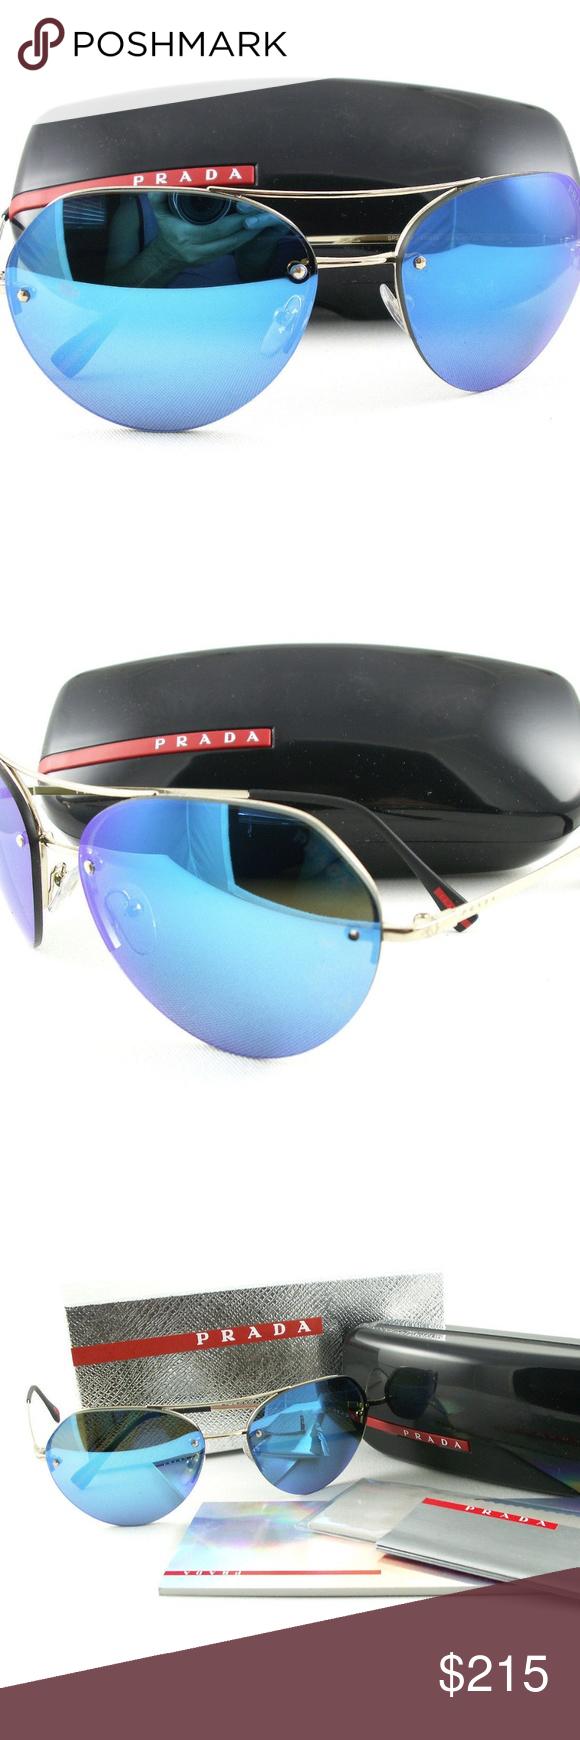 7a08ec1d5b PRADA SPORT Sunglasses PRADA SPORT 0PS 57RS ZVN5M2 59 METAL SUNGLASSES WITH  CASE MADE IN ITALY Product 66137 Bridge width 36 mm Caliber 59 mm Lens  height 51 ...